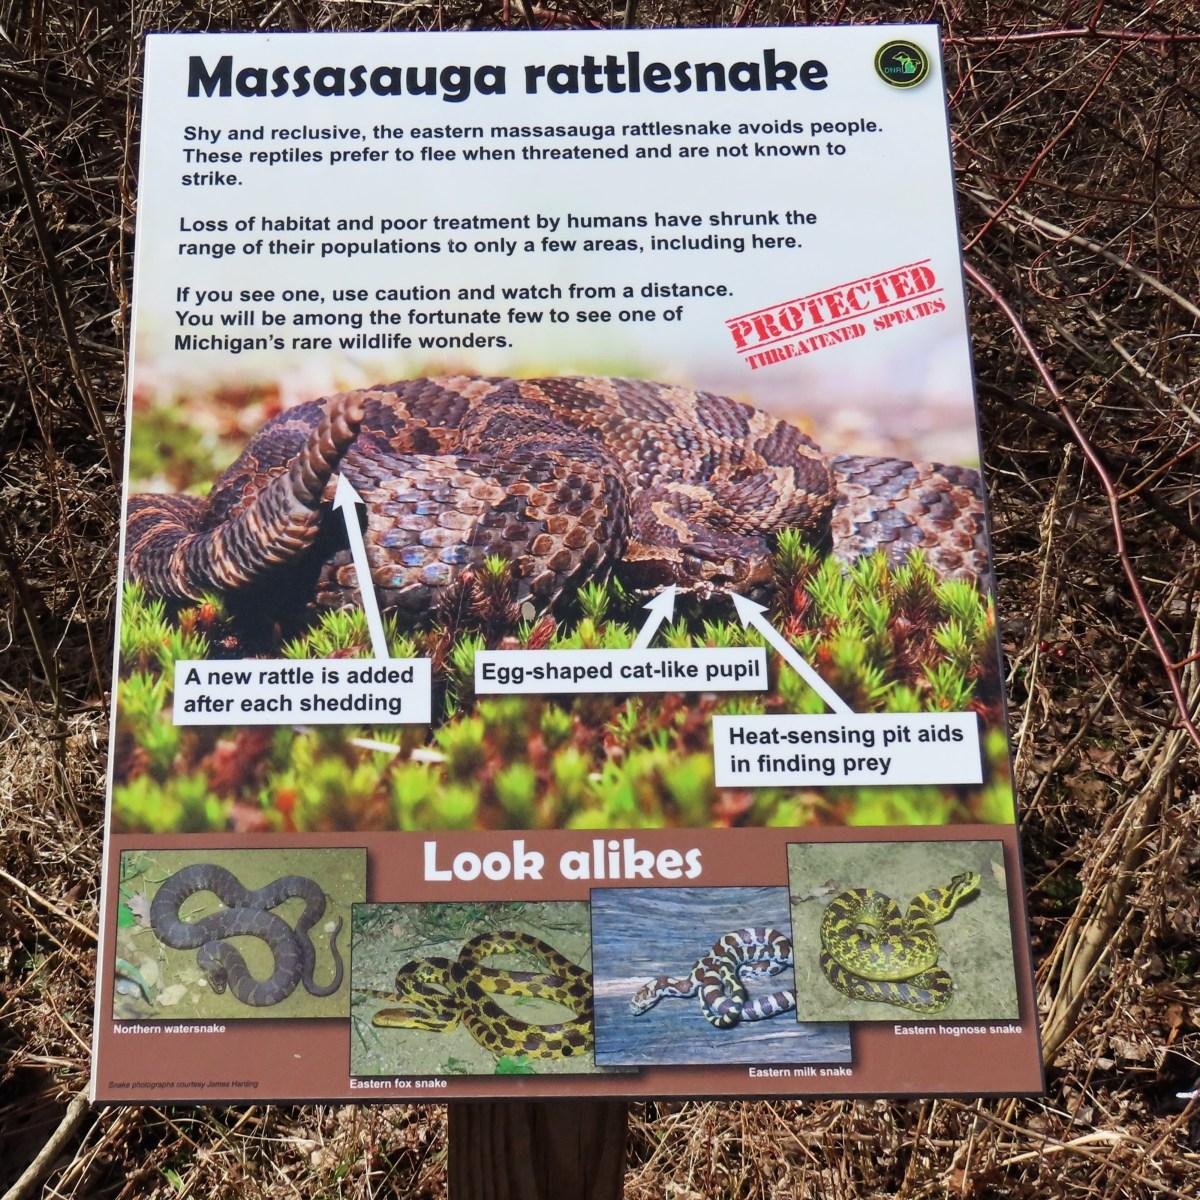 An outdoor interpretive sign detailing the Massasauga Rattlesnake